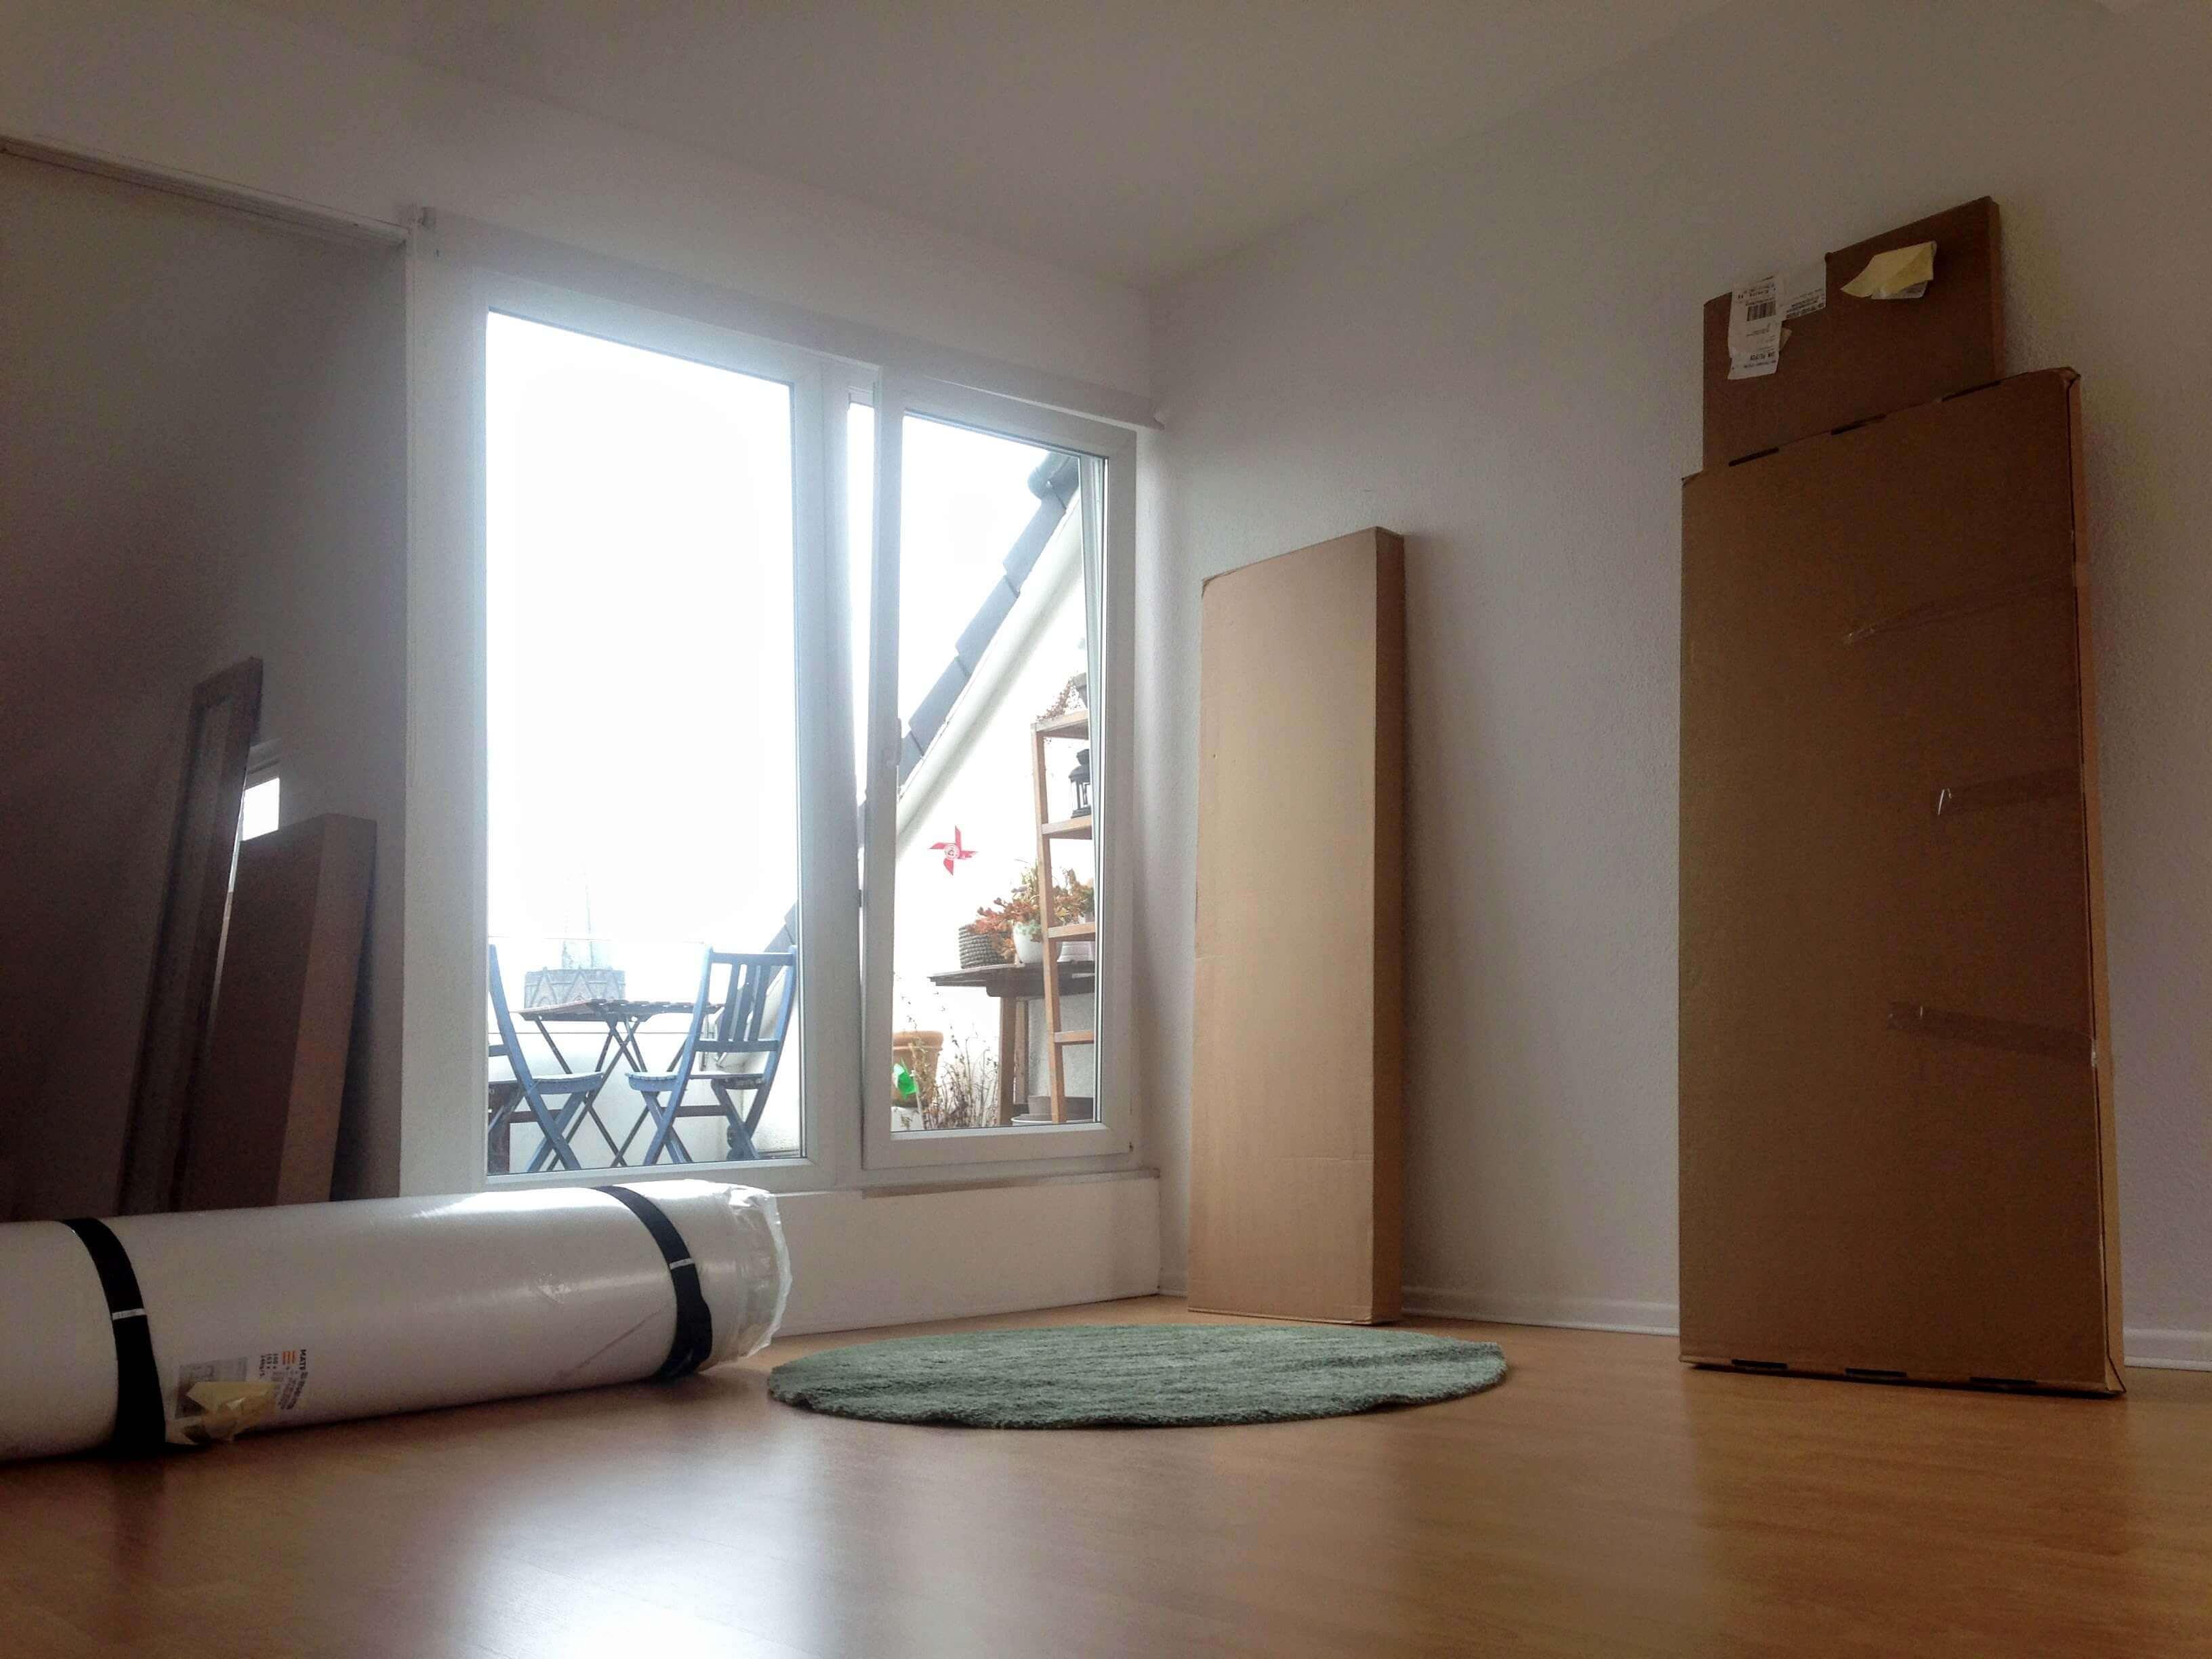 alquilar-piso-en-bonn-alemania